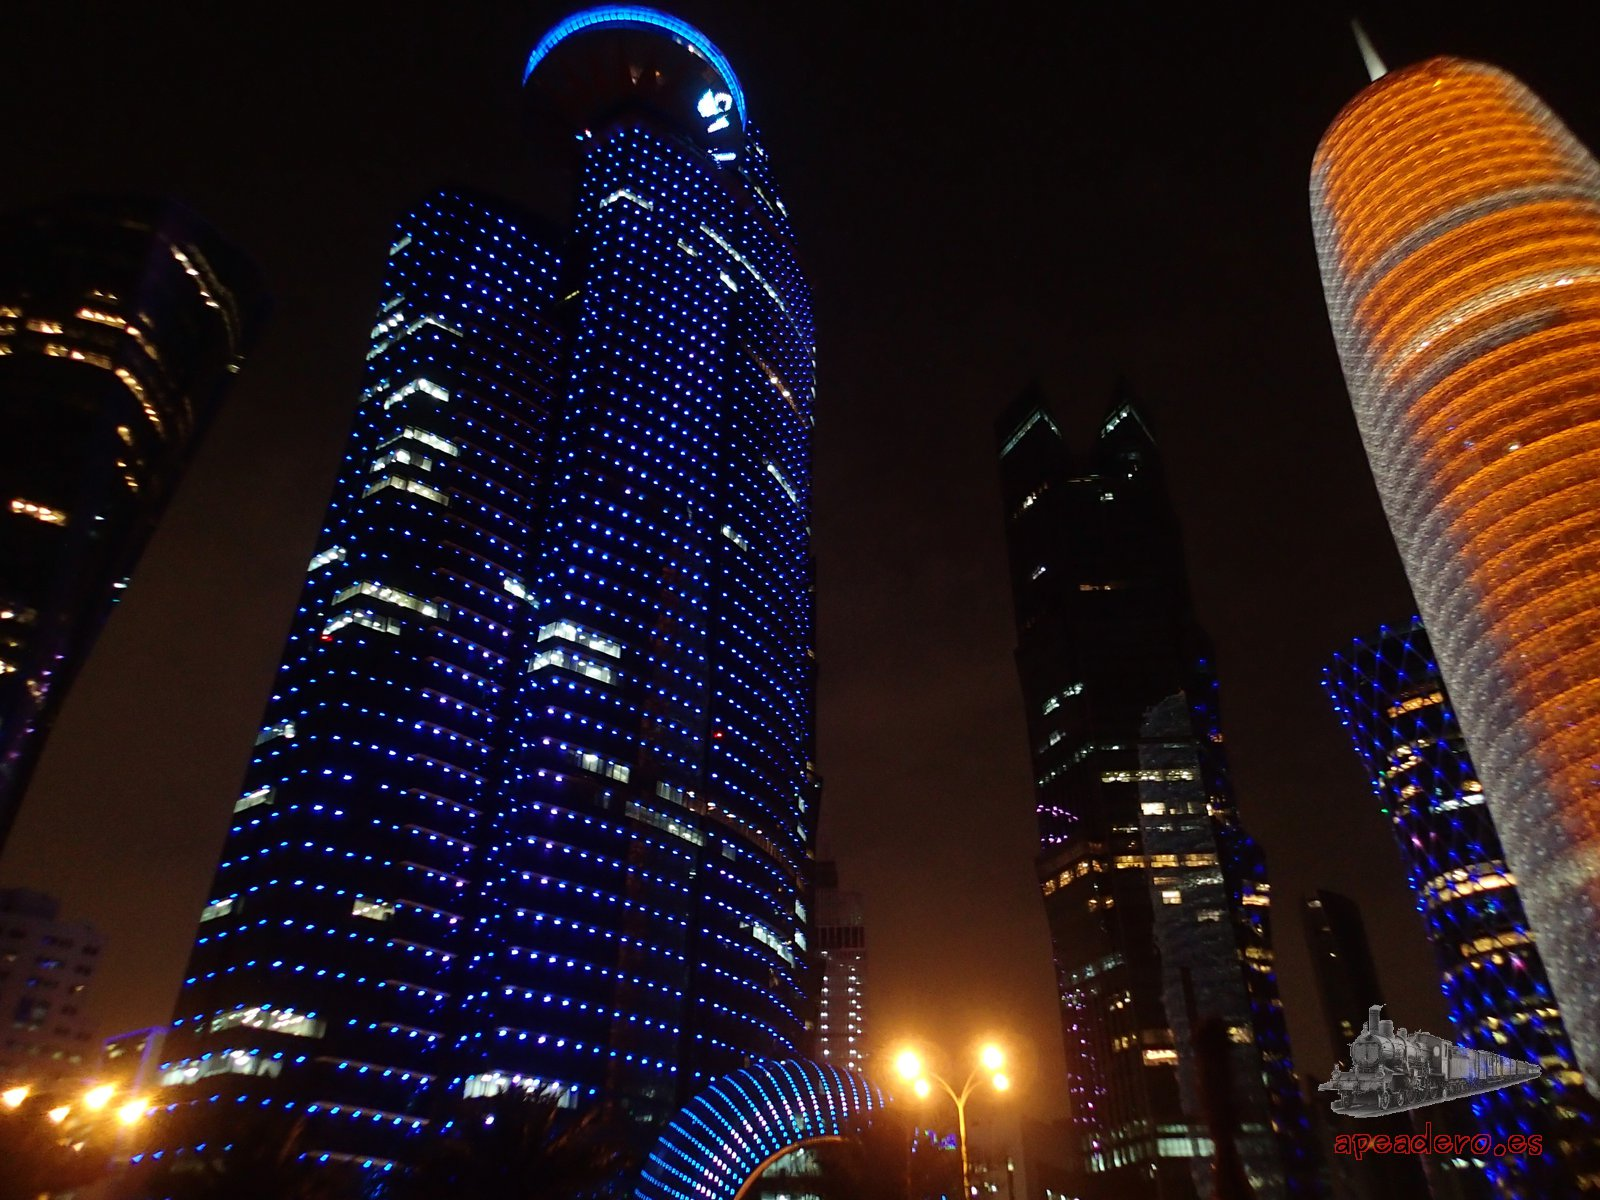 Tour gratuito por Doha con Qatar o noche de alojamiento gratis